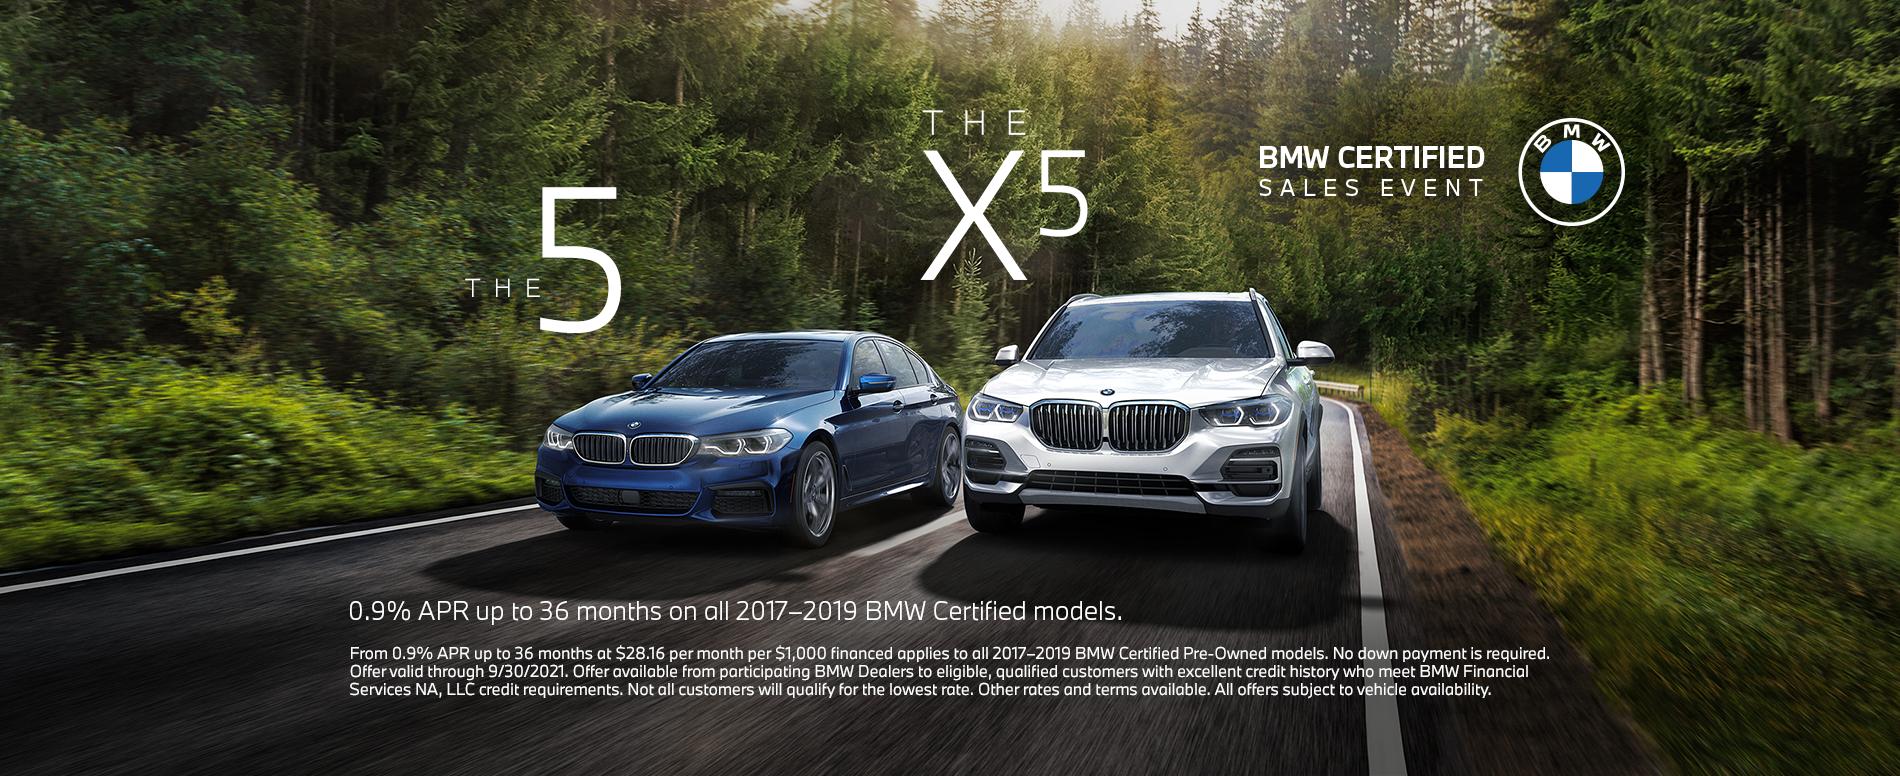 BMWNA-GE052004-Certified-Sales-Event-530i-FMA-1900×776